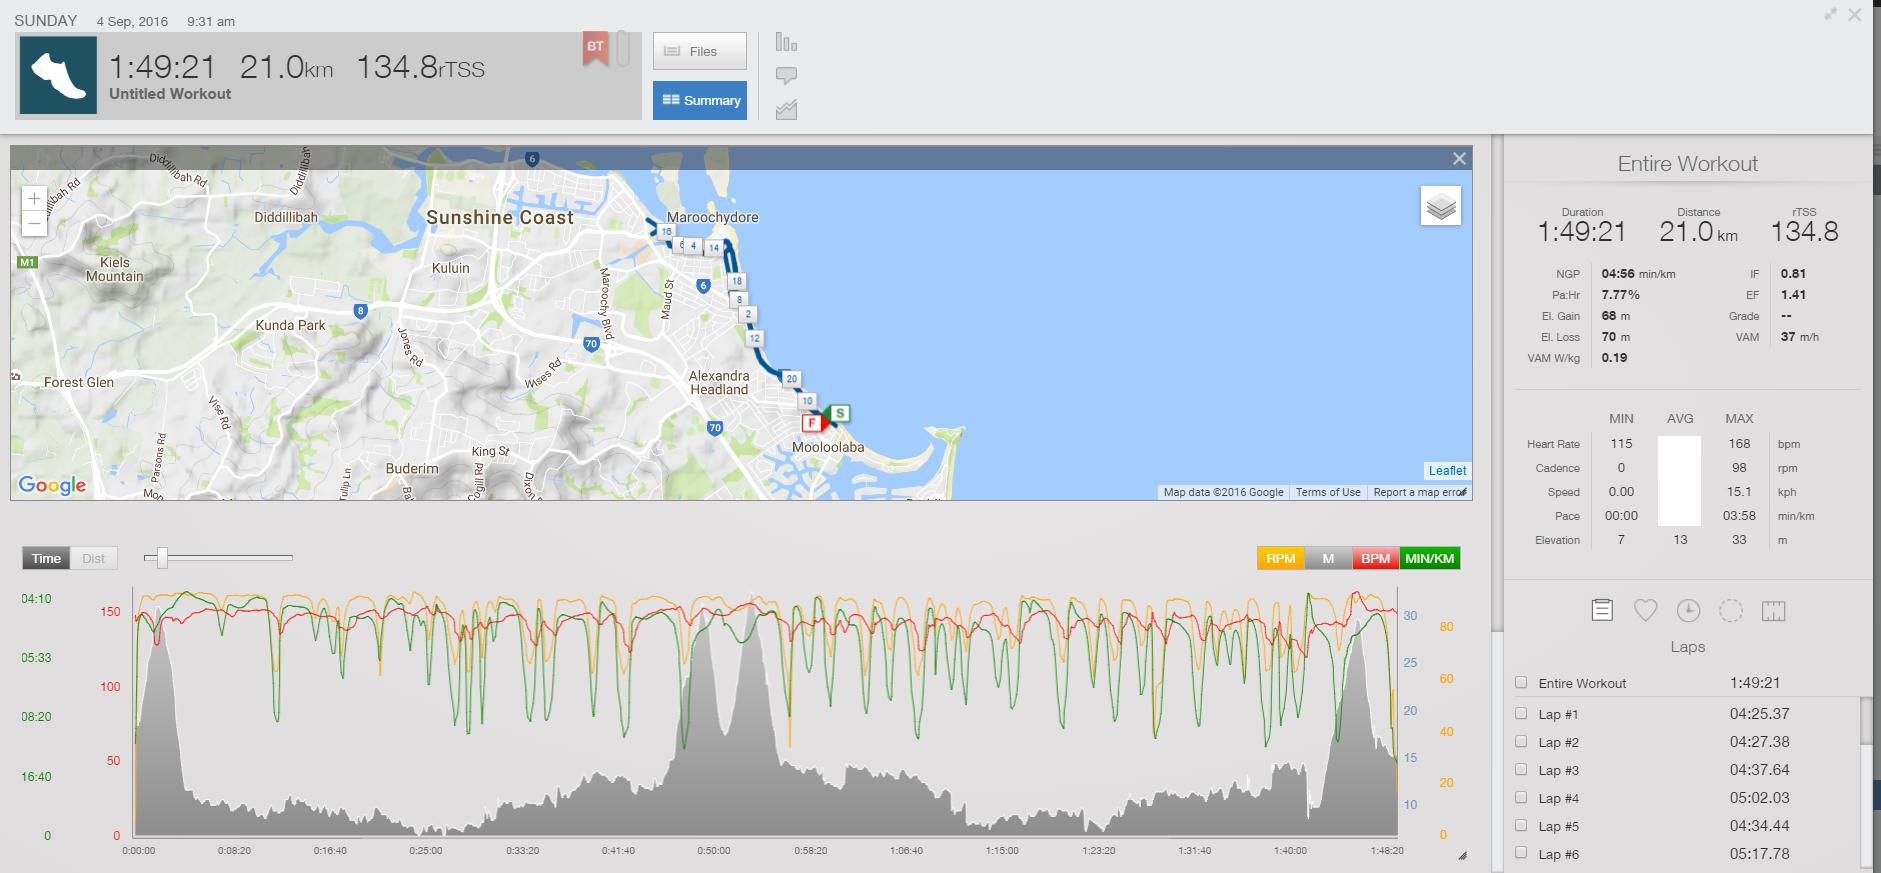 Renee's running data across the 21km's